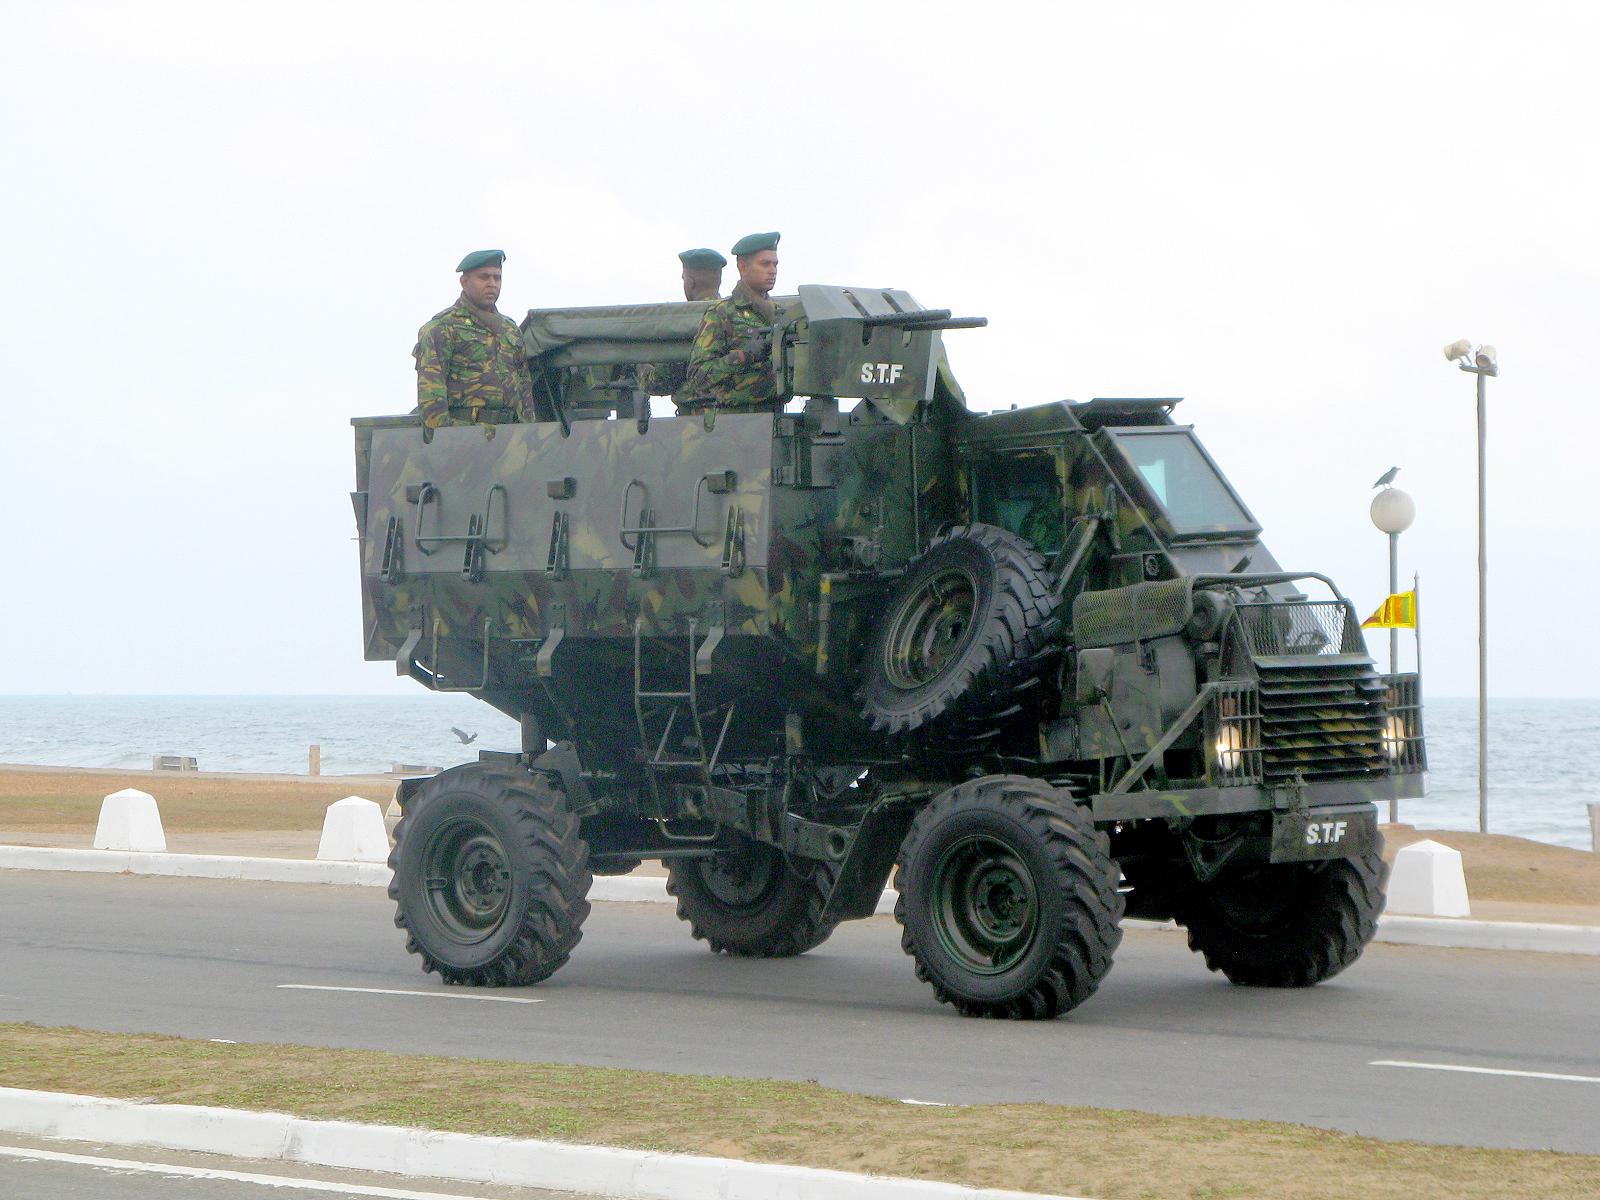 https://cdn.discordapp.com/attachments/510515265834844160/636271257658196000/Sri_Lanka_Military_0204.jpg